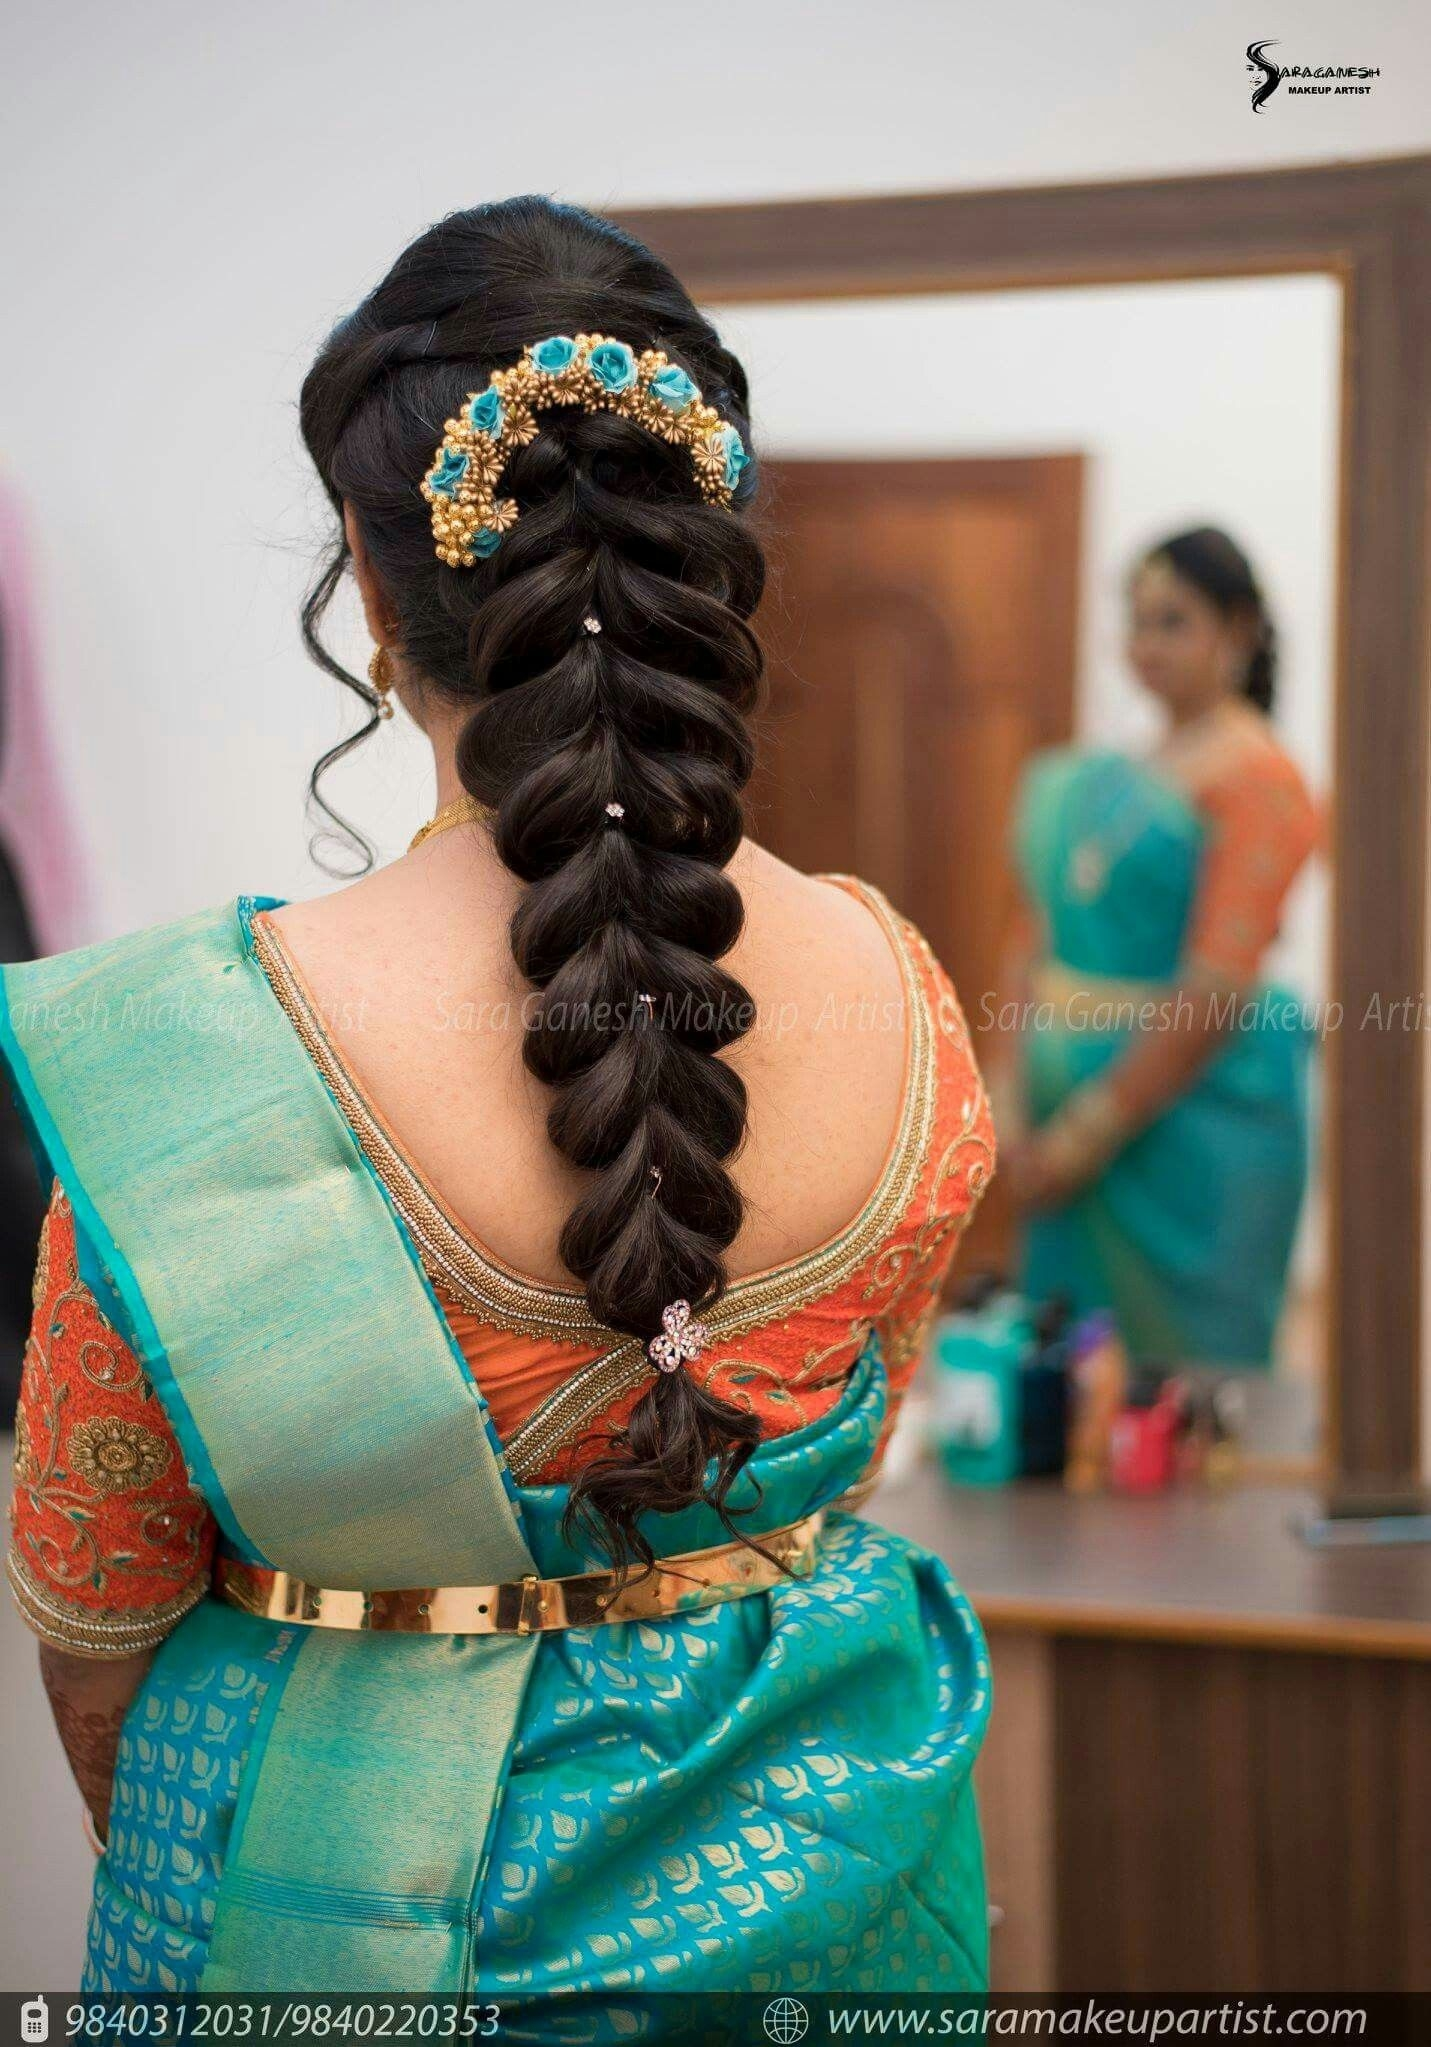 Hair Do | Hair Do | Indian Wedding Hairstyles, Wedding pertaining to South Indian Wedding Hairstyles For Long Hair